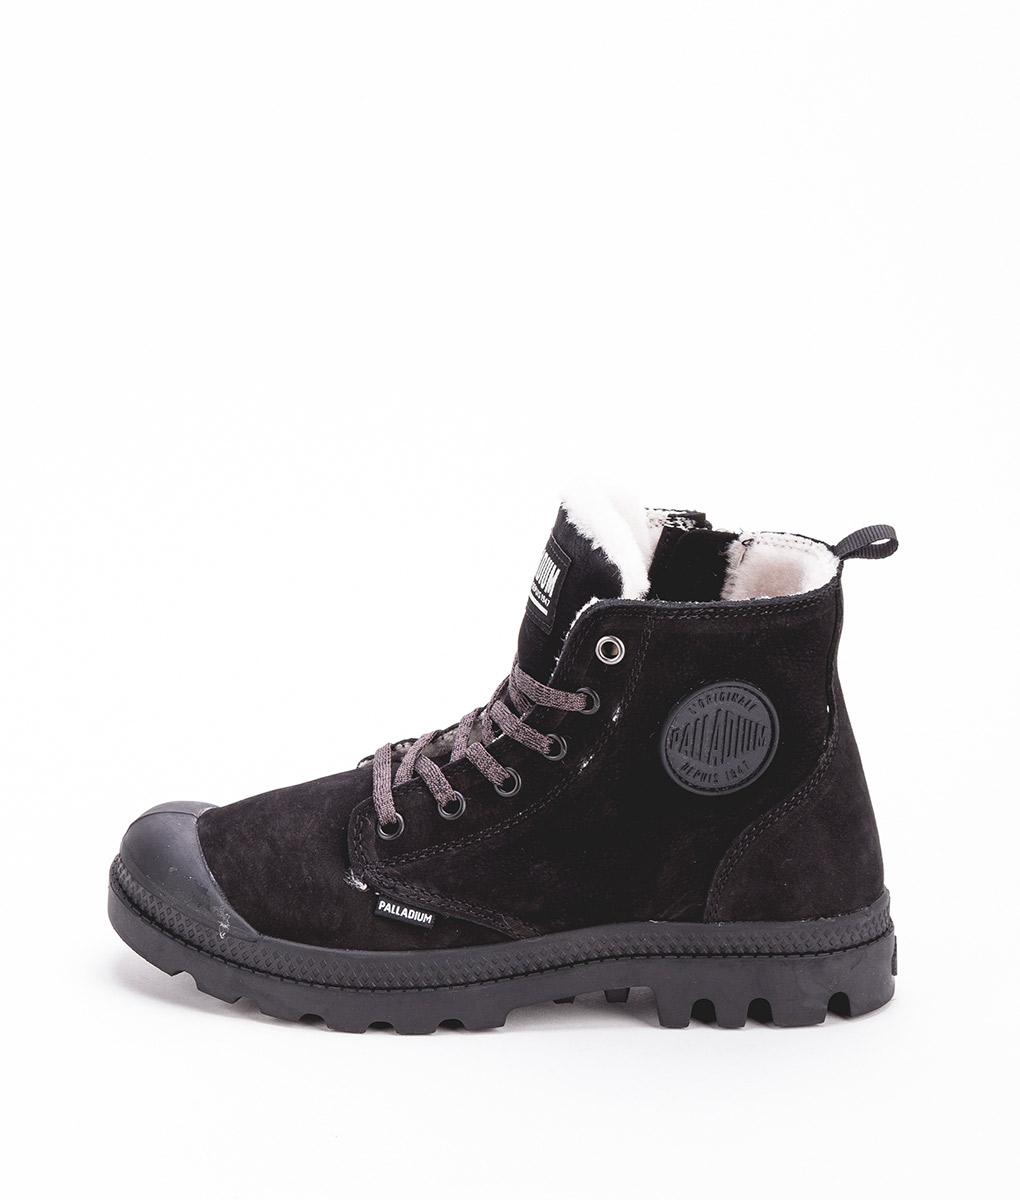 2822b787a07 PALLADIUM Women Sneakers 96102 PAMPA HI S ZIP LEATHER, Black Black 119.99